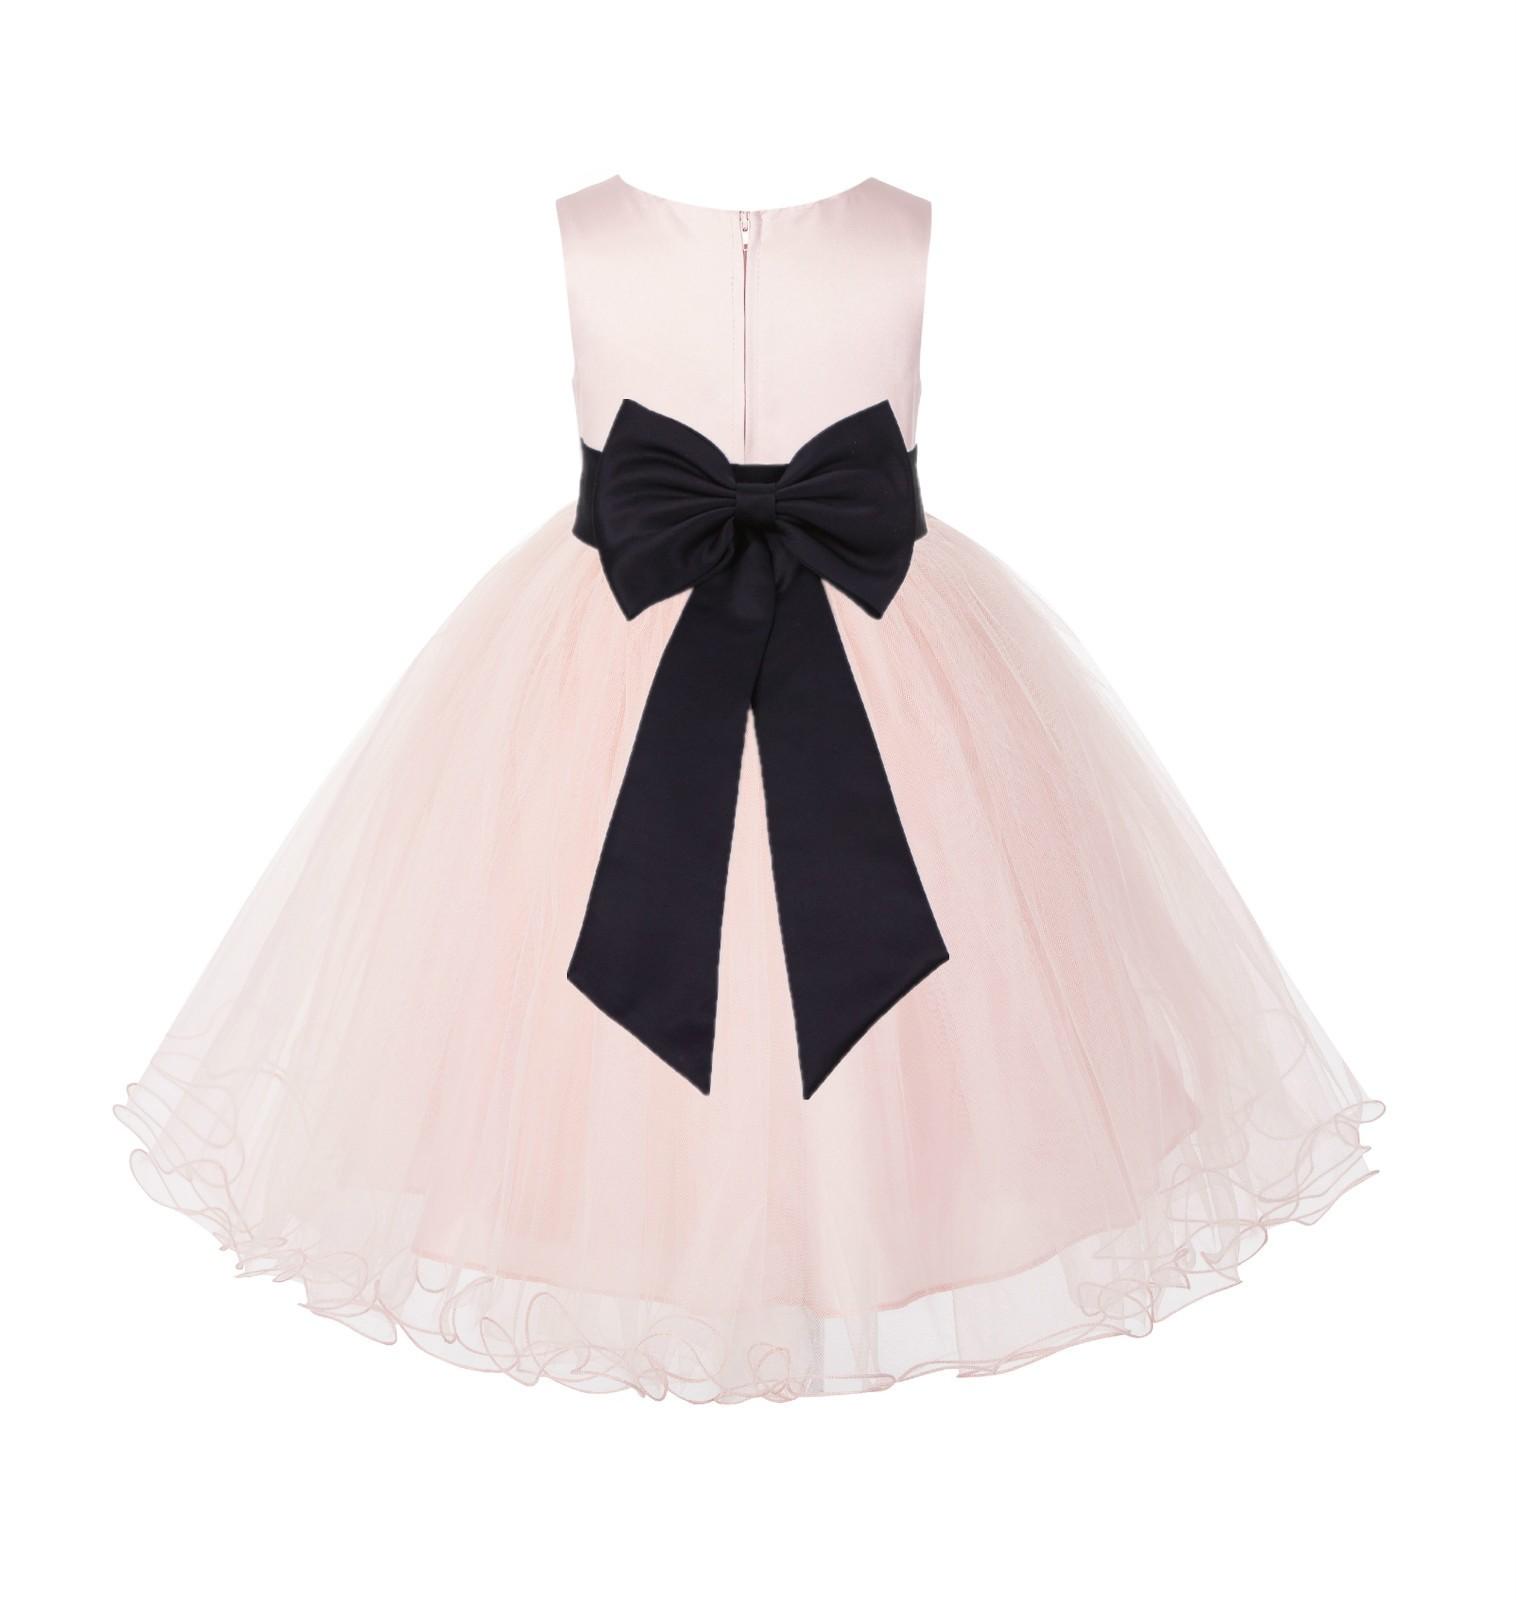 Blush PInk / Black Tulle Rattail Edge Flower Girl Dress Wedding Bridesmaid 829T